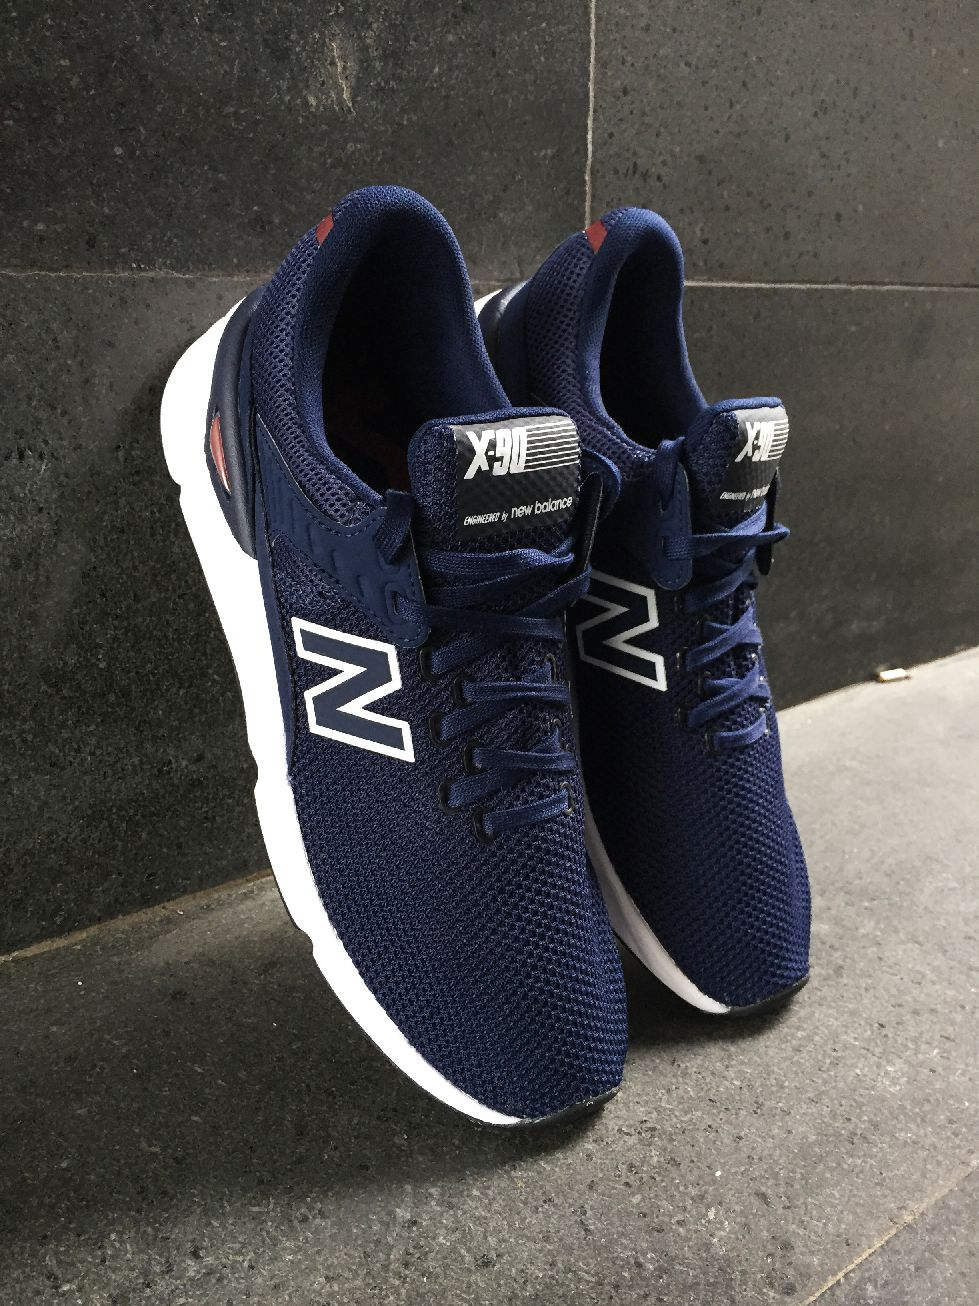 x90 new balance uomo blu